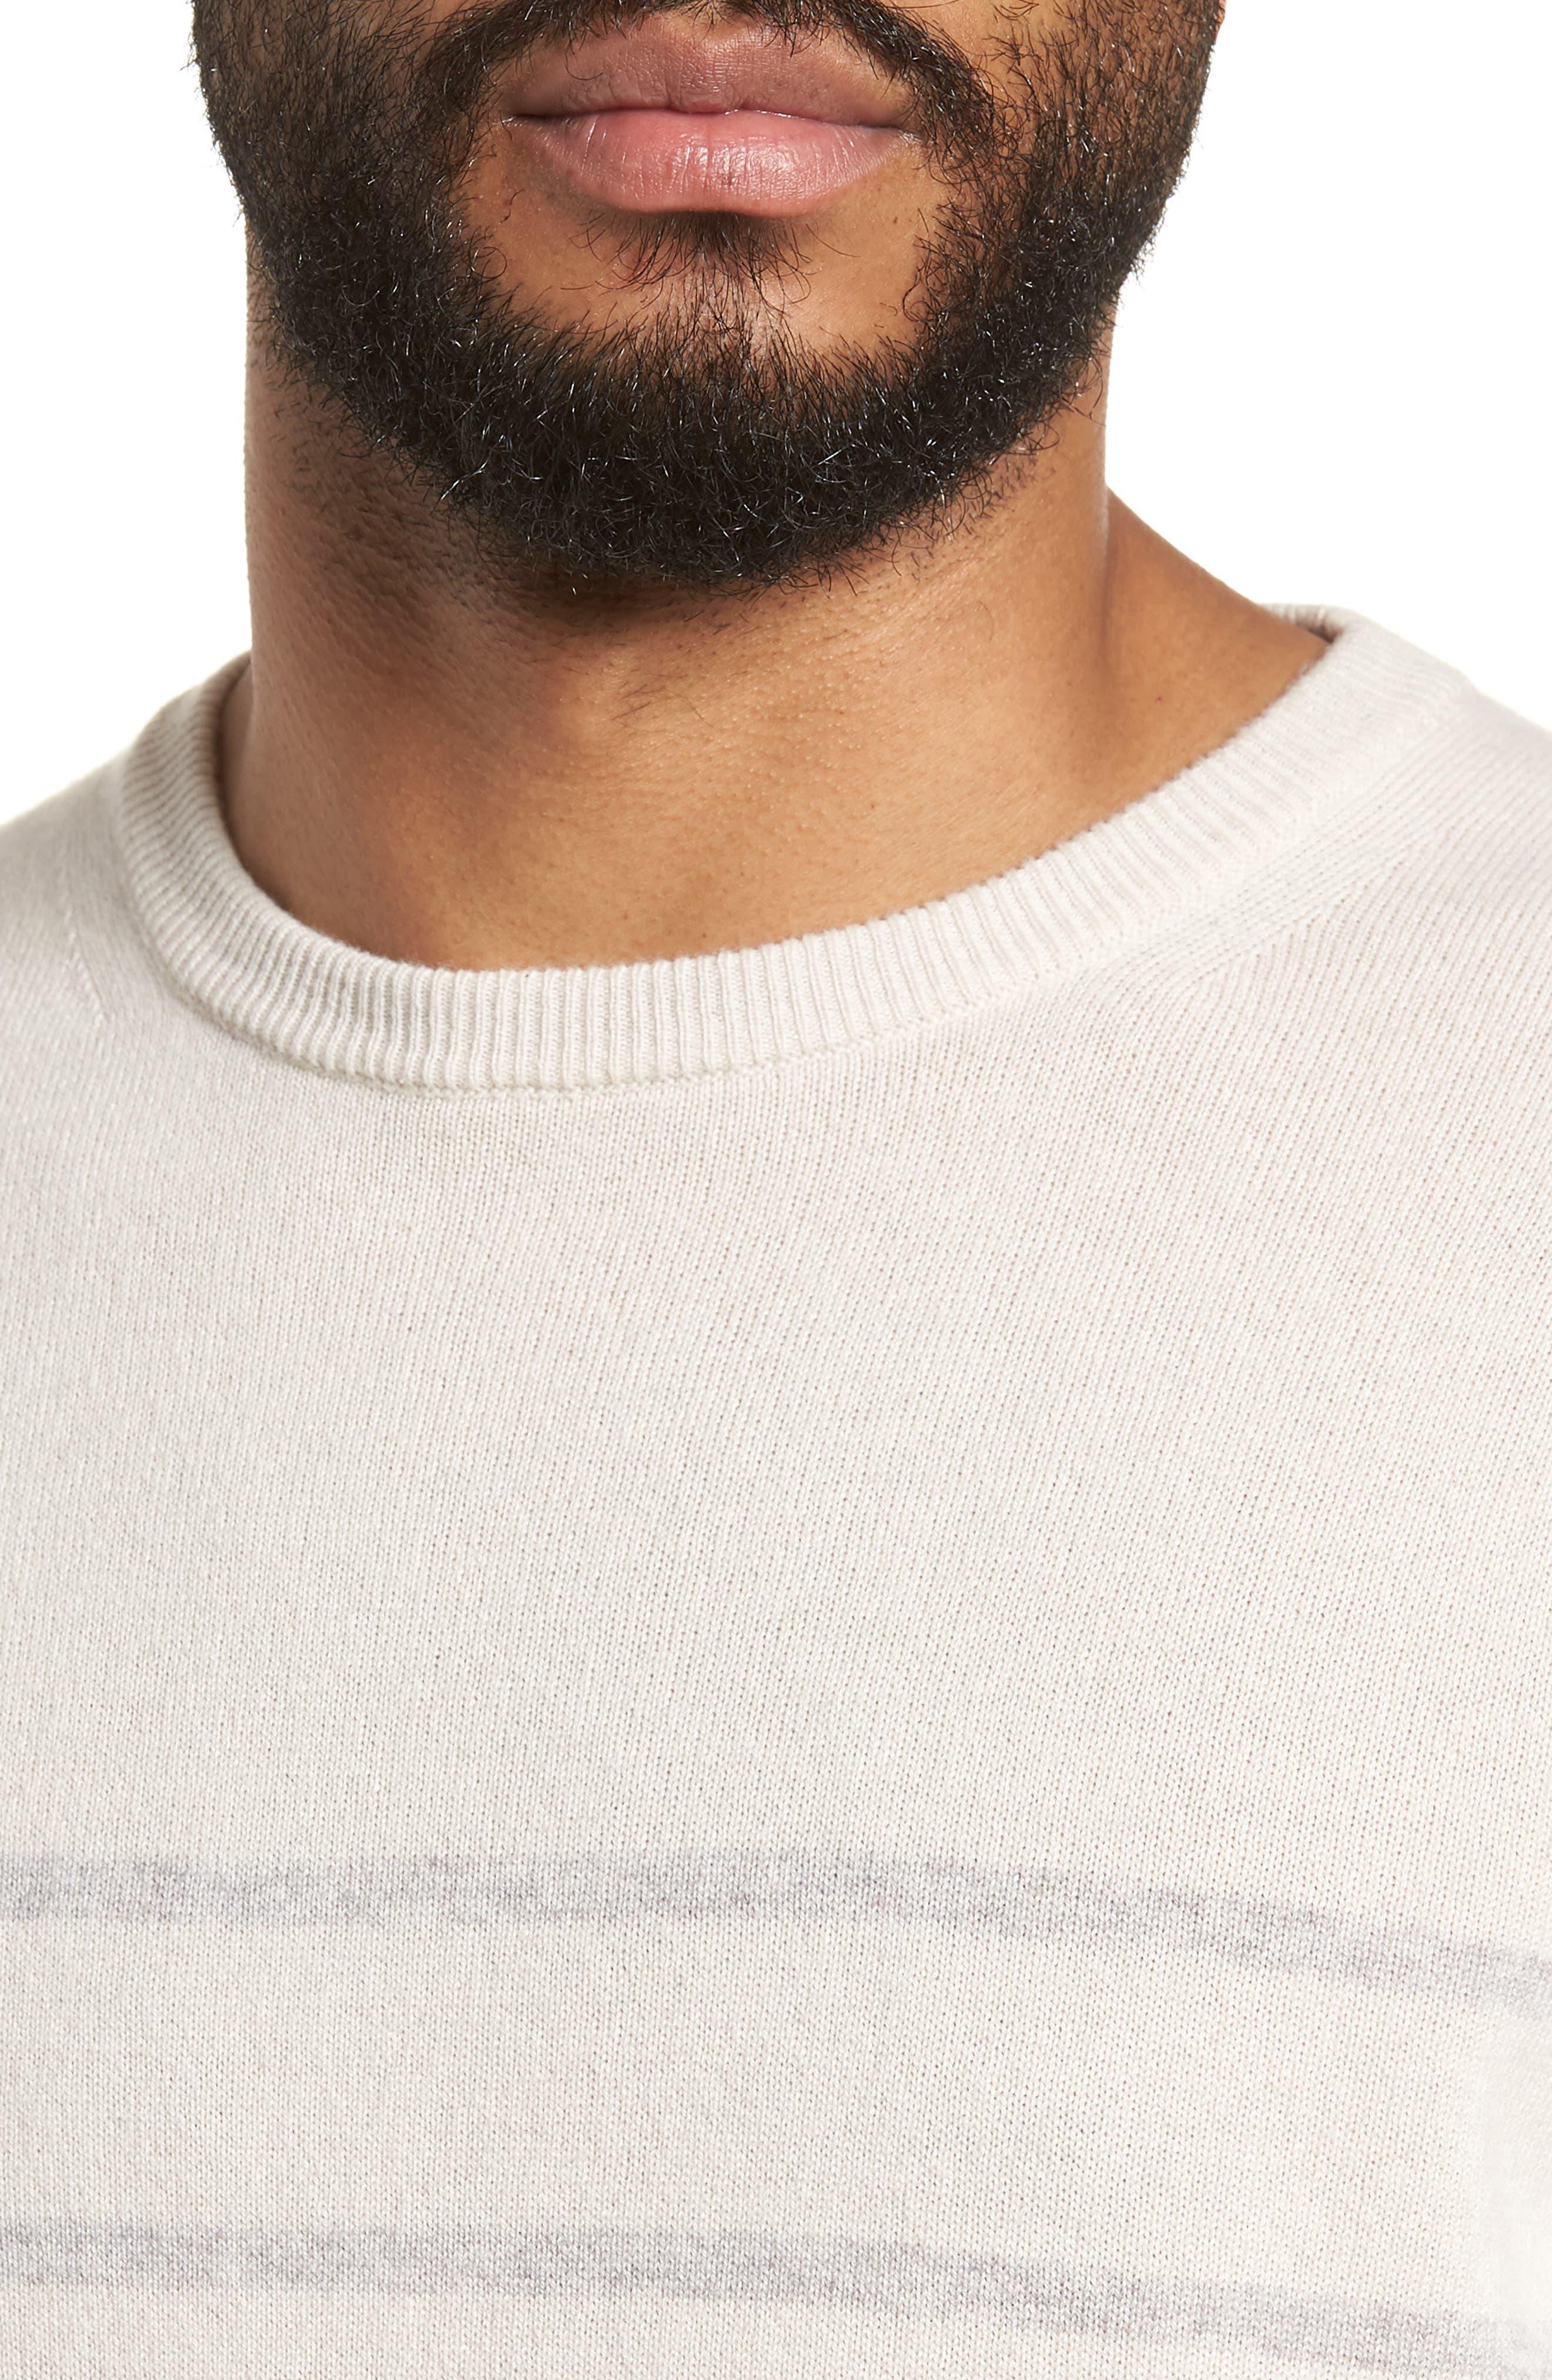 Cashmere Crewneck Sweater,                             Alternate thumbnail 4, color,                             102